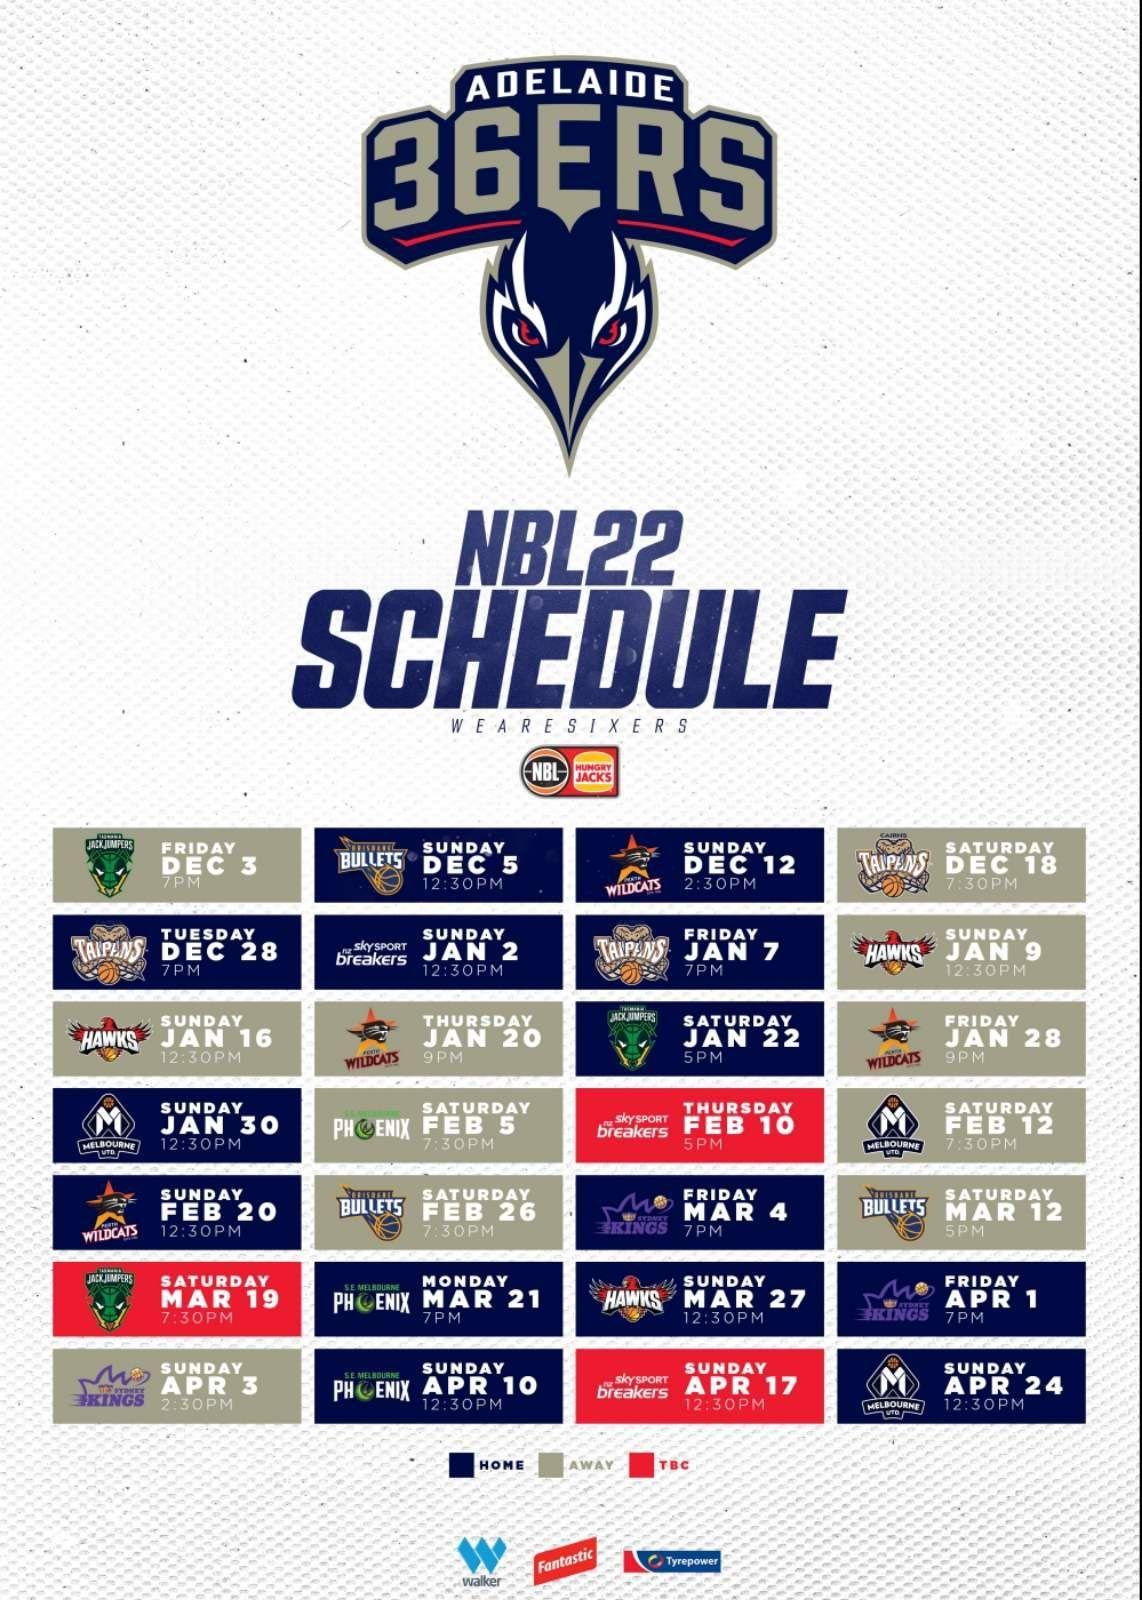 Adelaide 36ers schedule